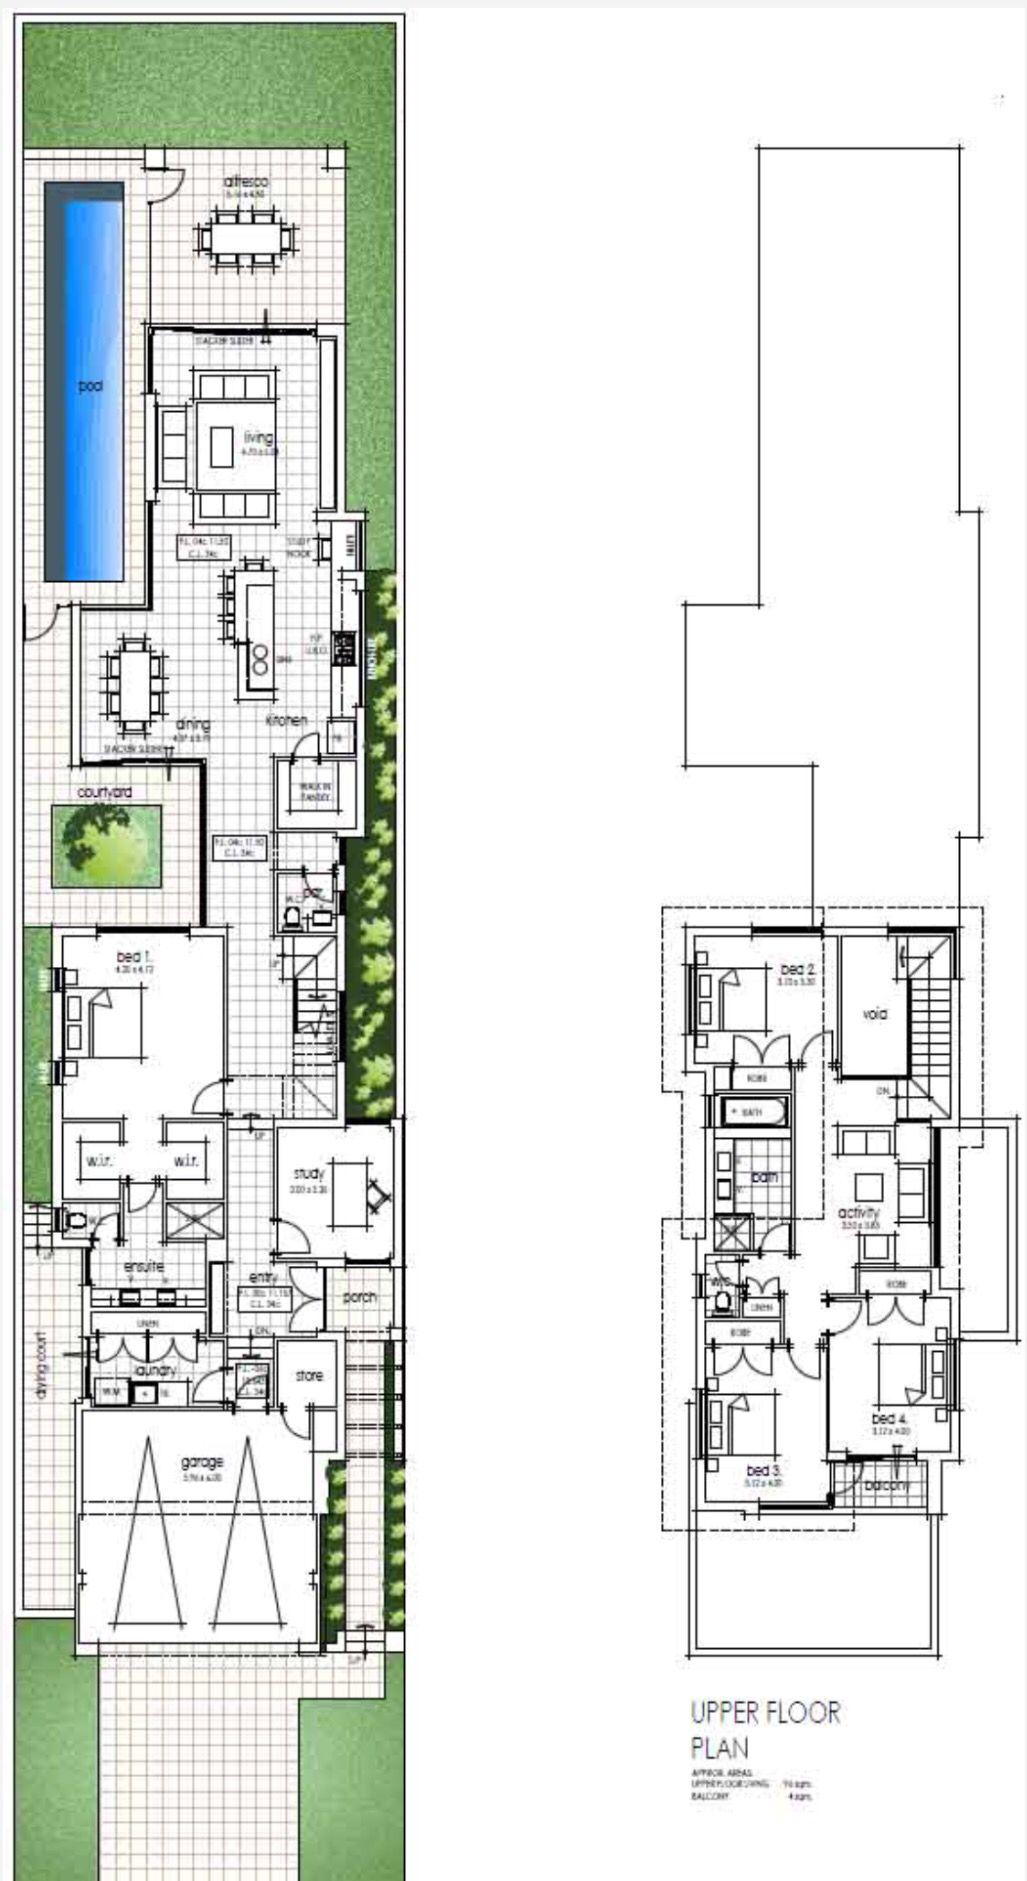 Longhouse Floor Plan 1 Narrow House Designs Narrow House Plans Narrow Lot House Plans